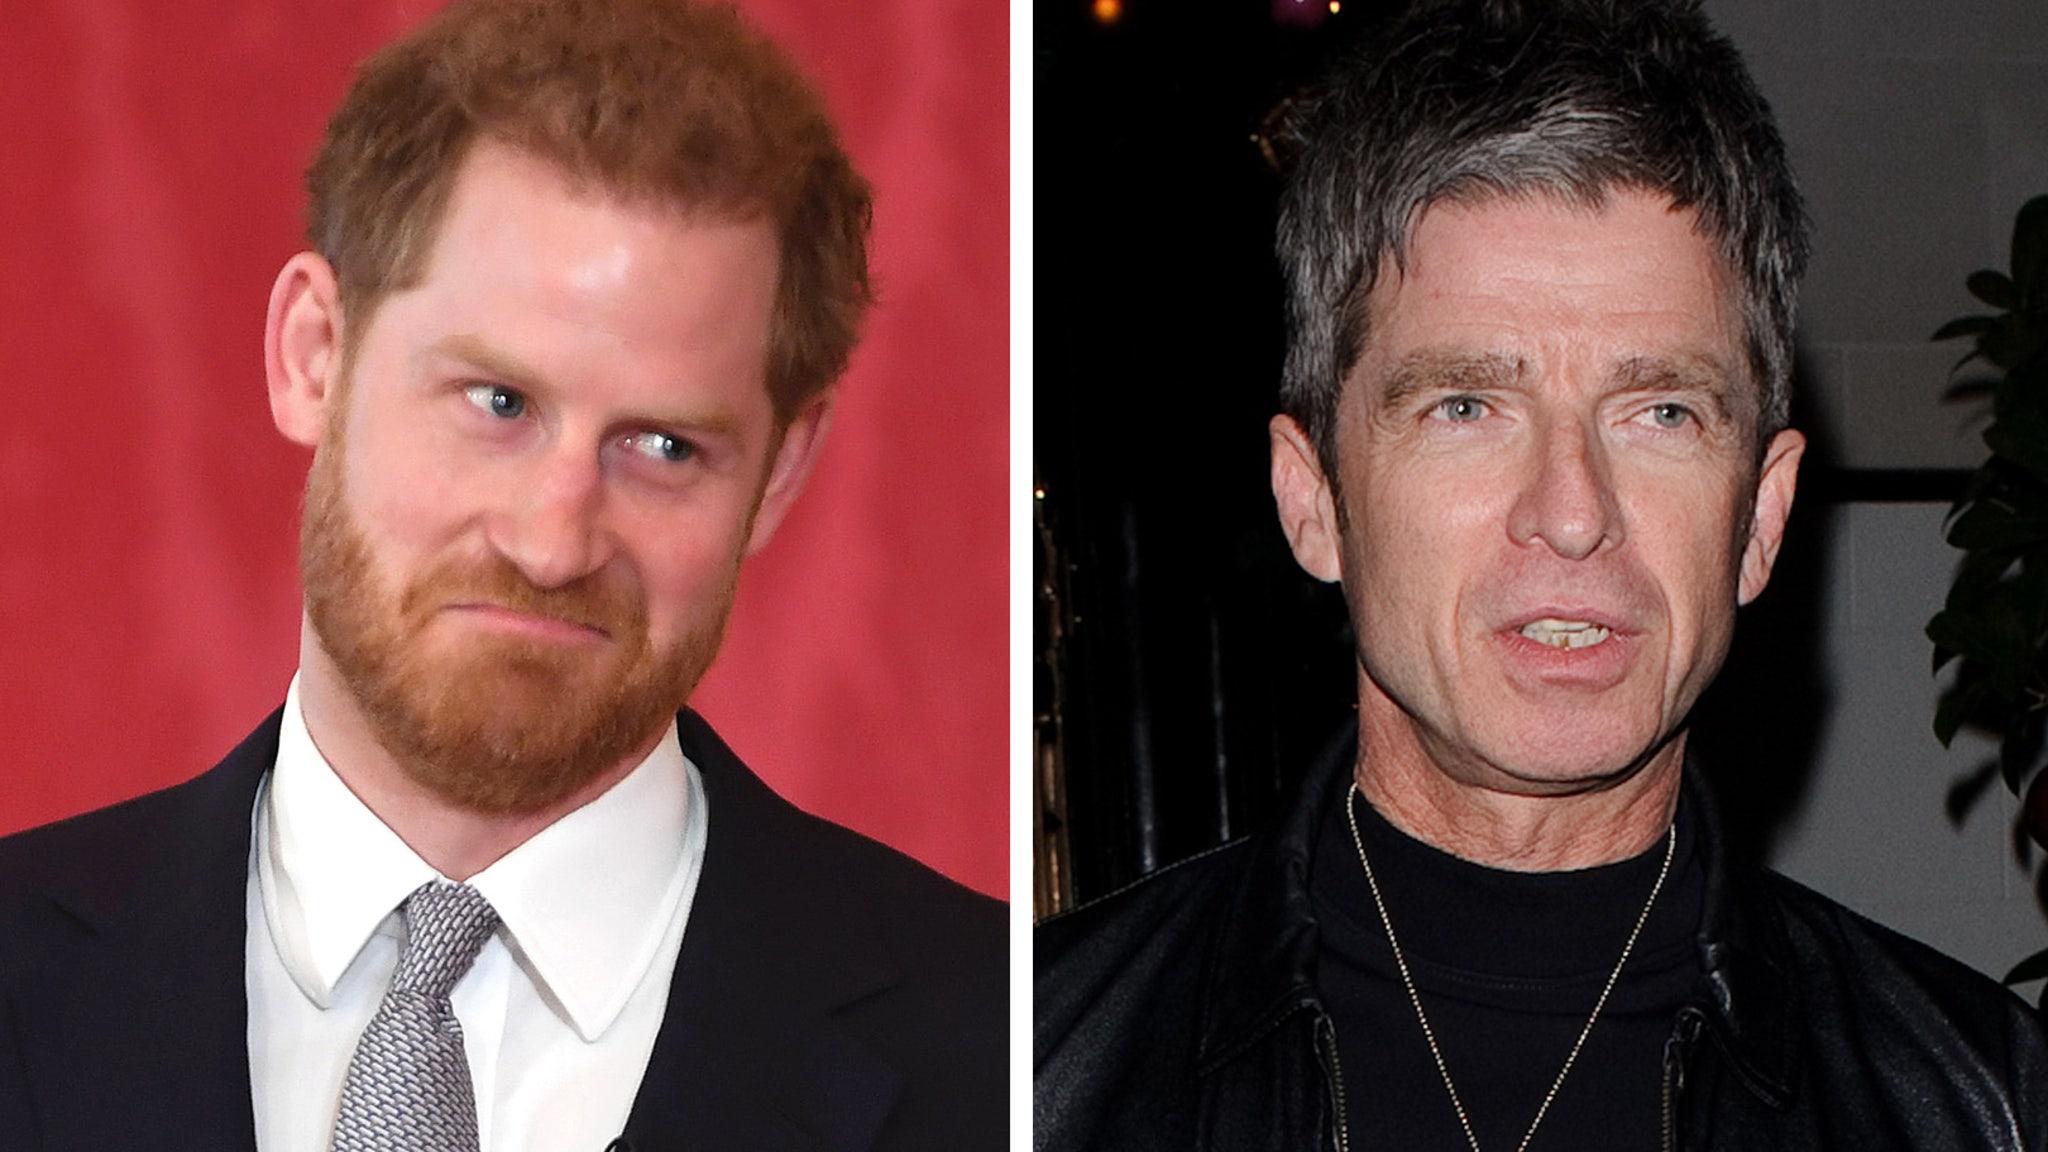 Noel Gallagher calls Prince Harry an 'awake snowflake'